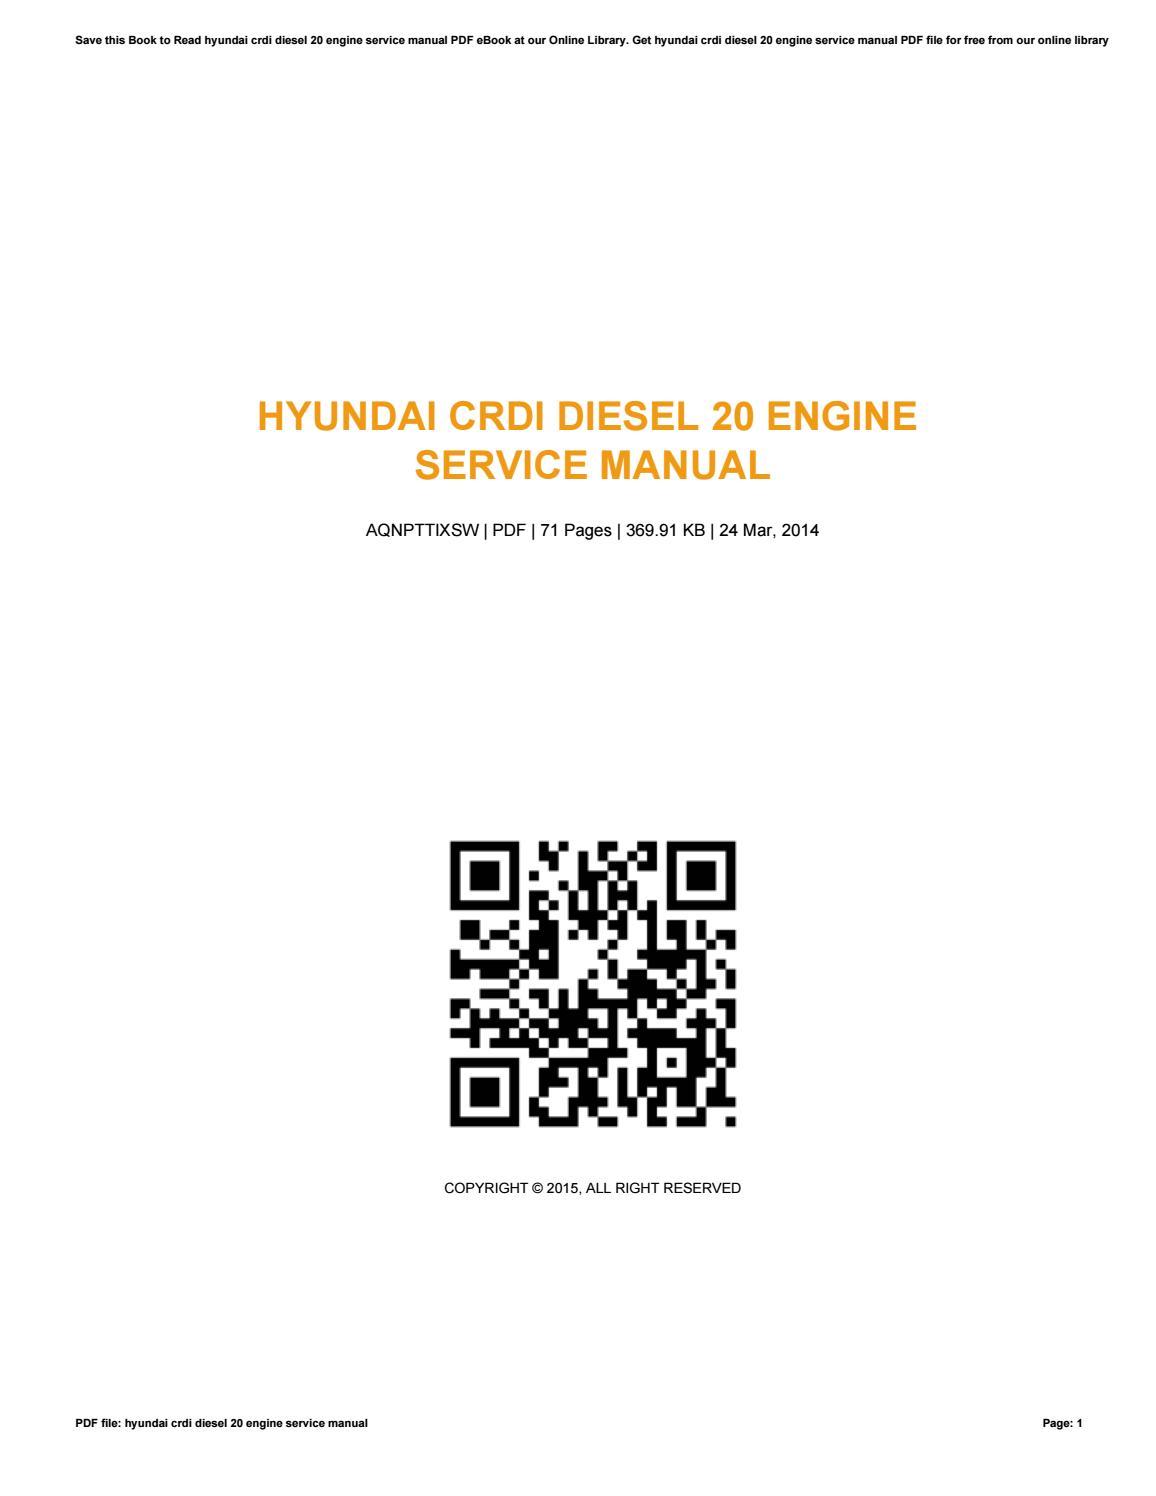 Hyundai crdi diesel 20 engine service manual by JonathanGrissett1526 - issuu